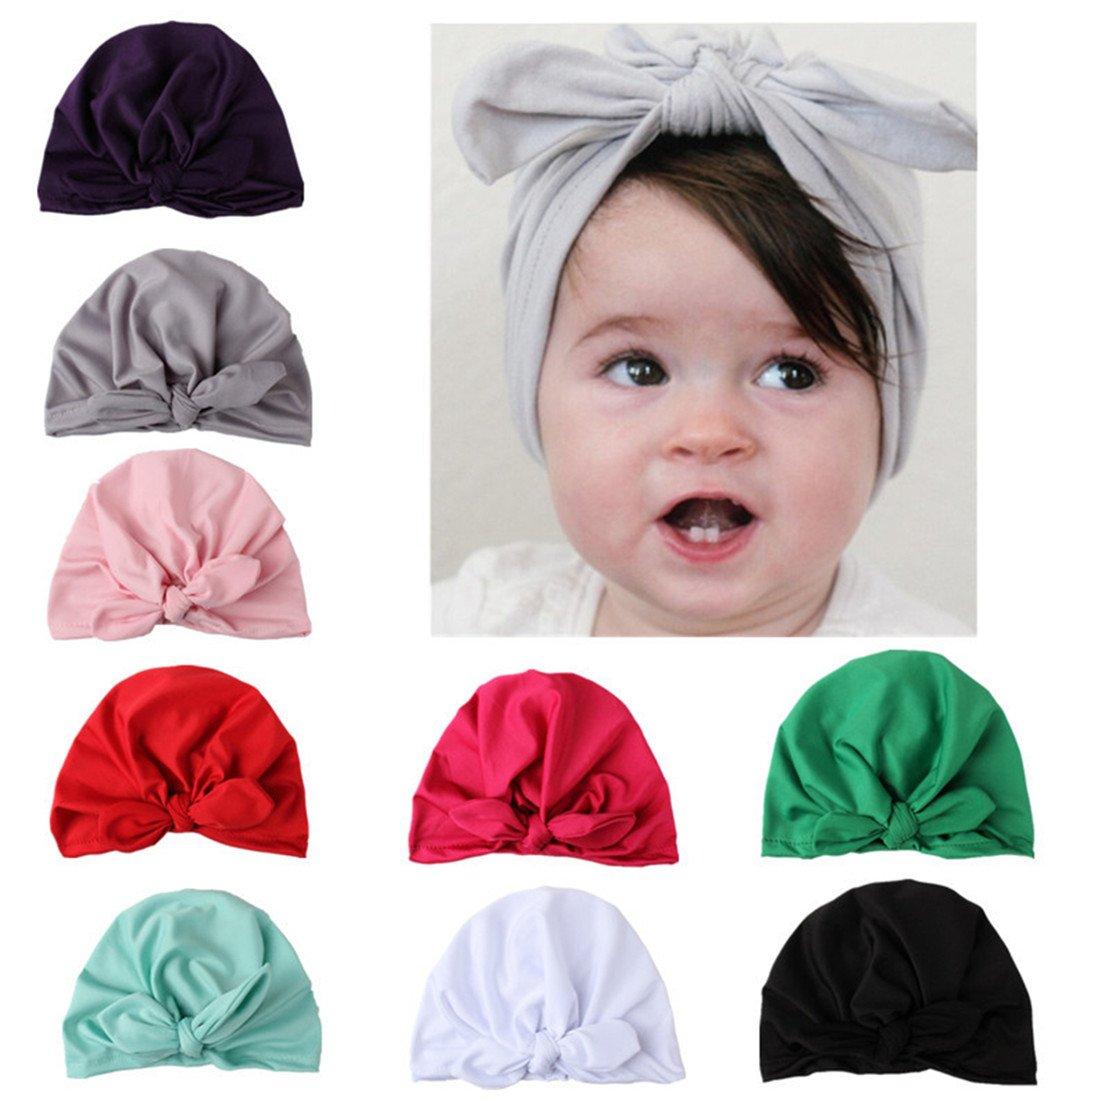 0b8db7fd7da CHSEEA Baby Gift Set - 9PCS Cute Baby Hat Set Elastic Turban Headbands Hair  Wraps Hairbands Hair Bow For Toddler Kids Photography Props